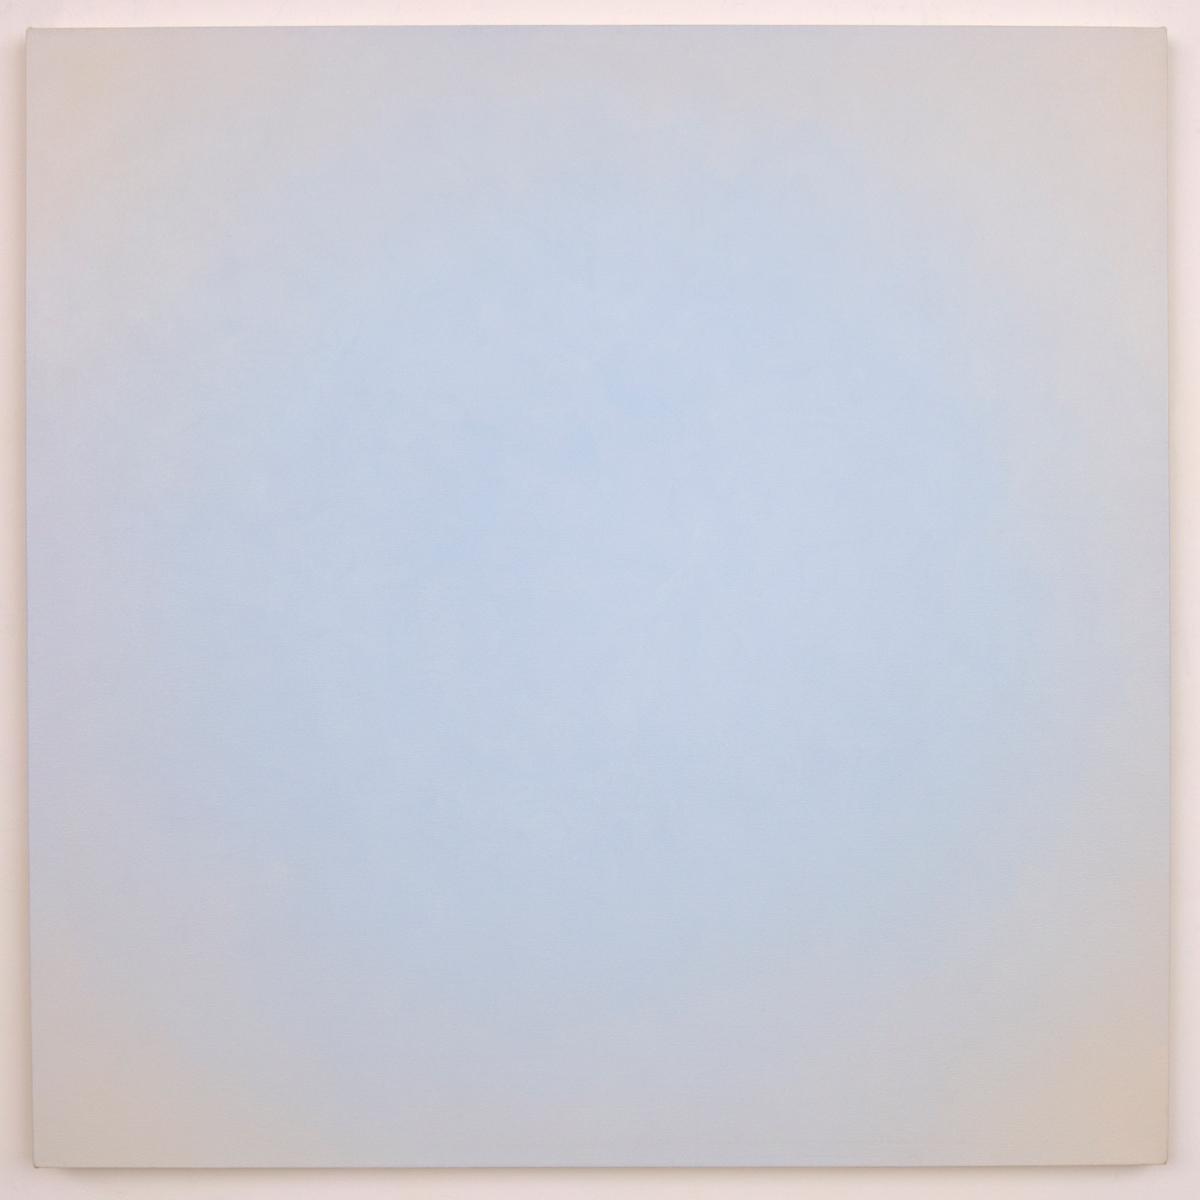 Blue Orange #7 (White/Orange), Equivalence Blue Orange Series, 2006, oil on canvas, 48 x 48 in. (122 x 122 cm.)